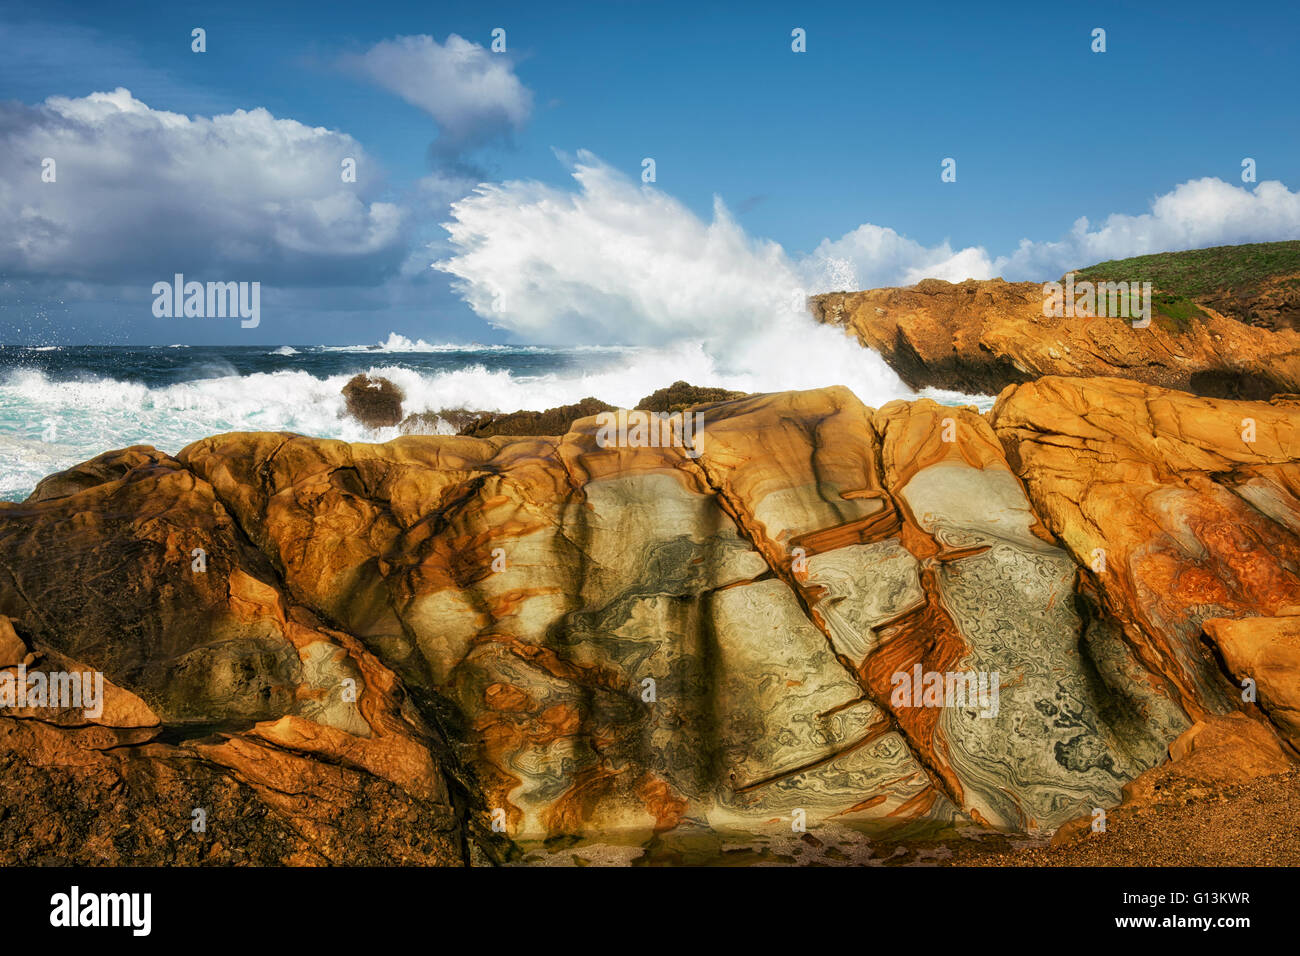 Mosaic Patterns Stockfotos & Mosaic Patterns Bilder - Alamy